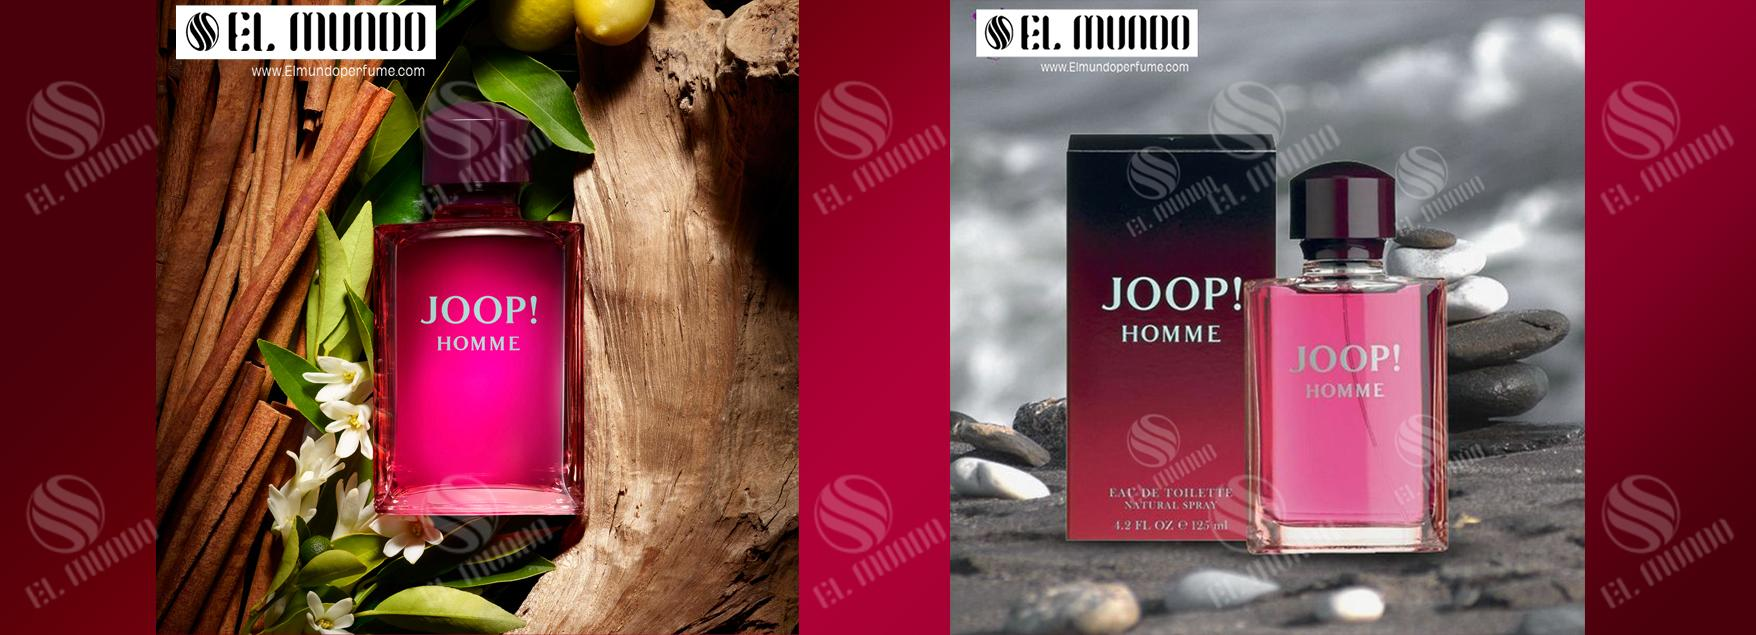 joop ad homme - عطر ادکلن مردانه جوپ هوم ادوتویلت ۱۲۵ میل Joop! Homme